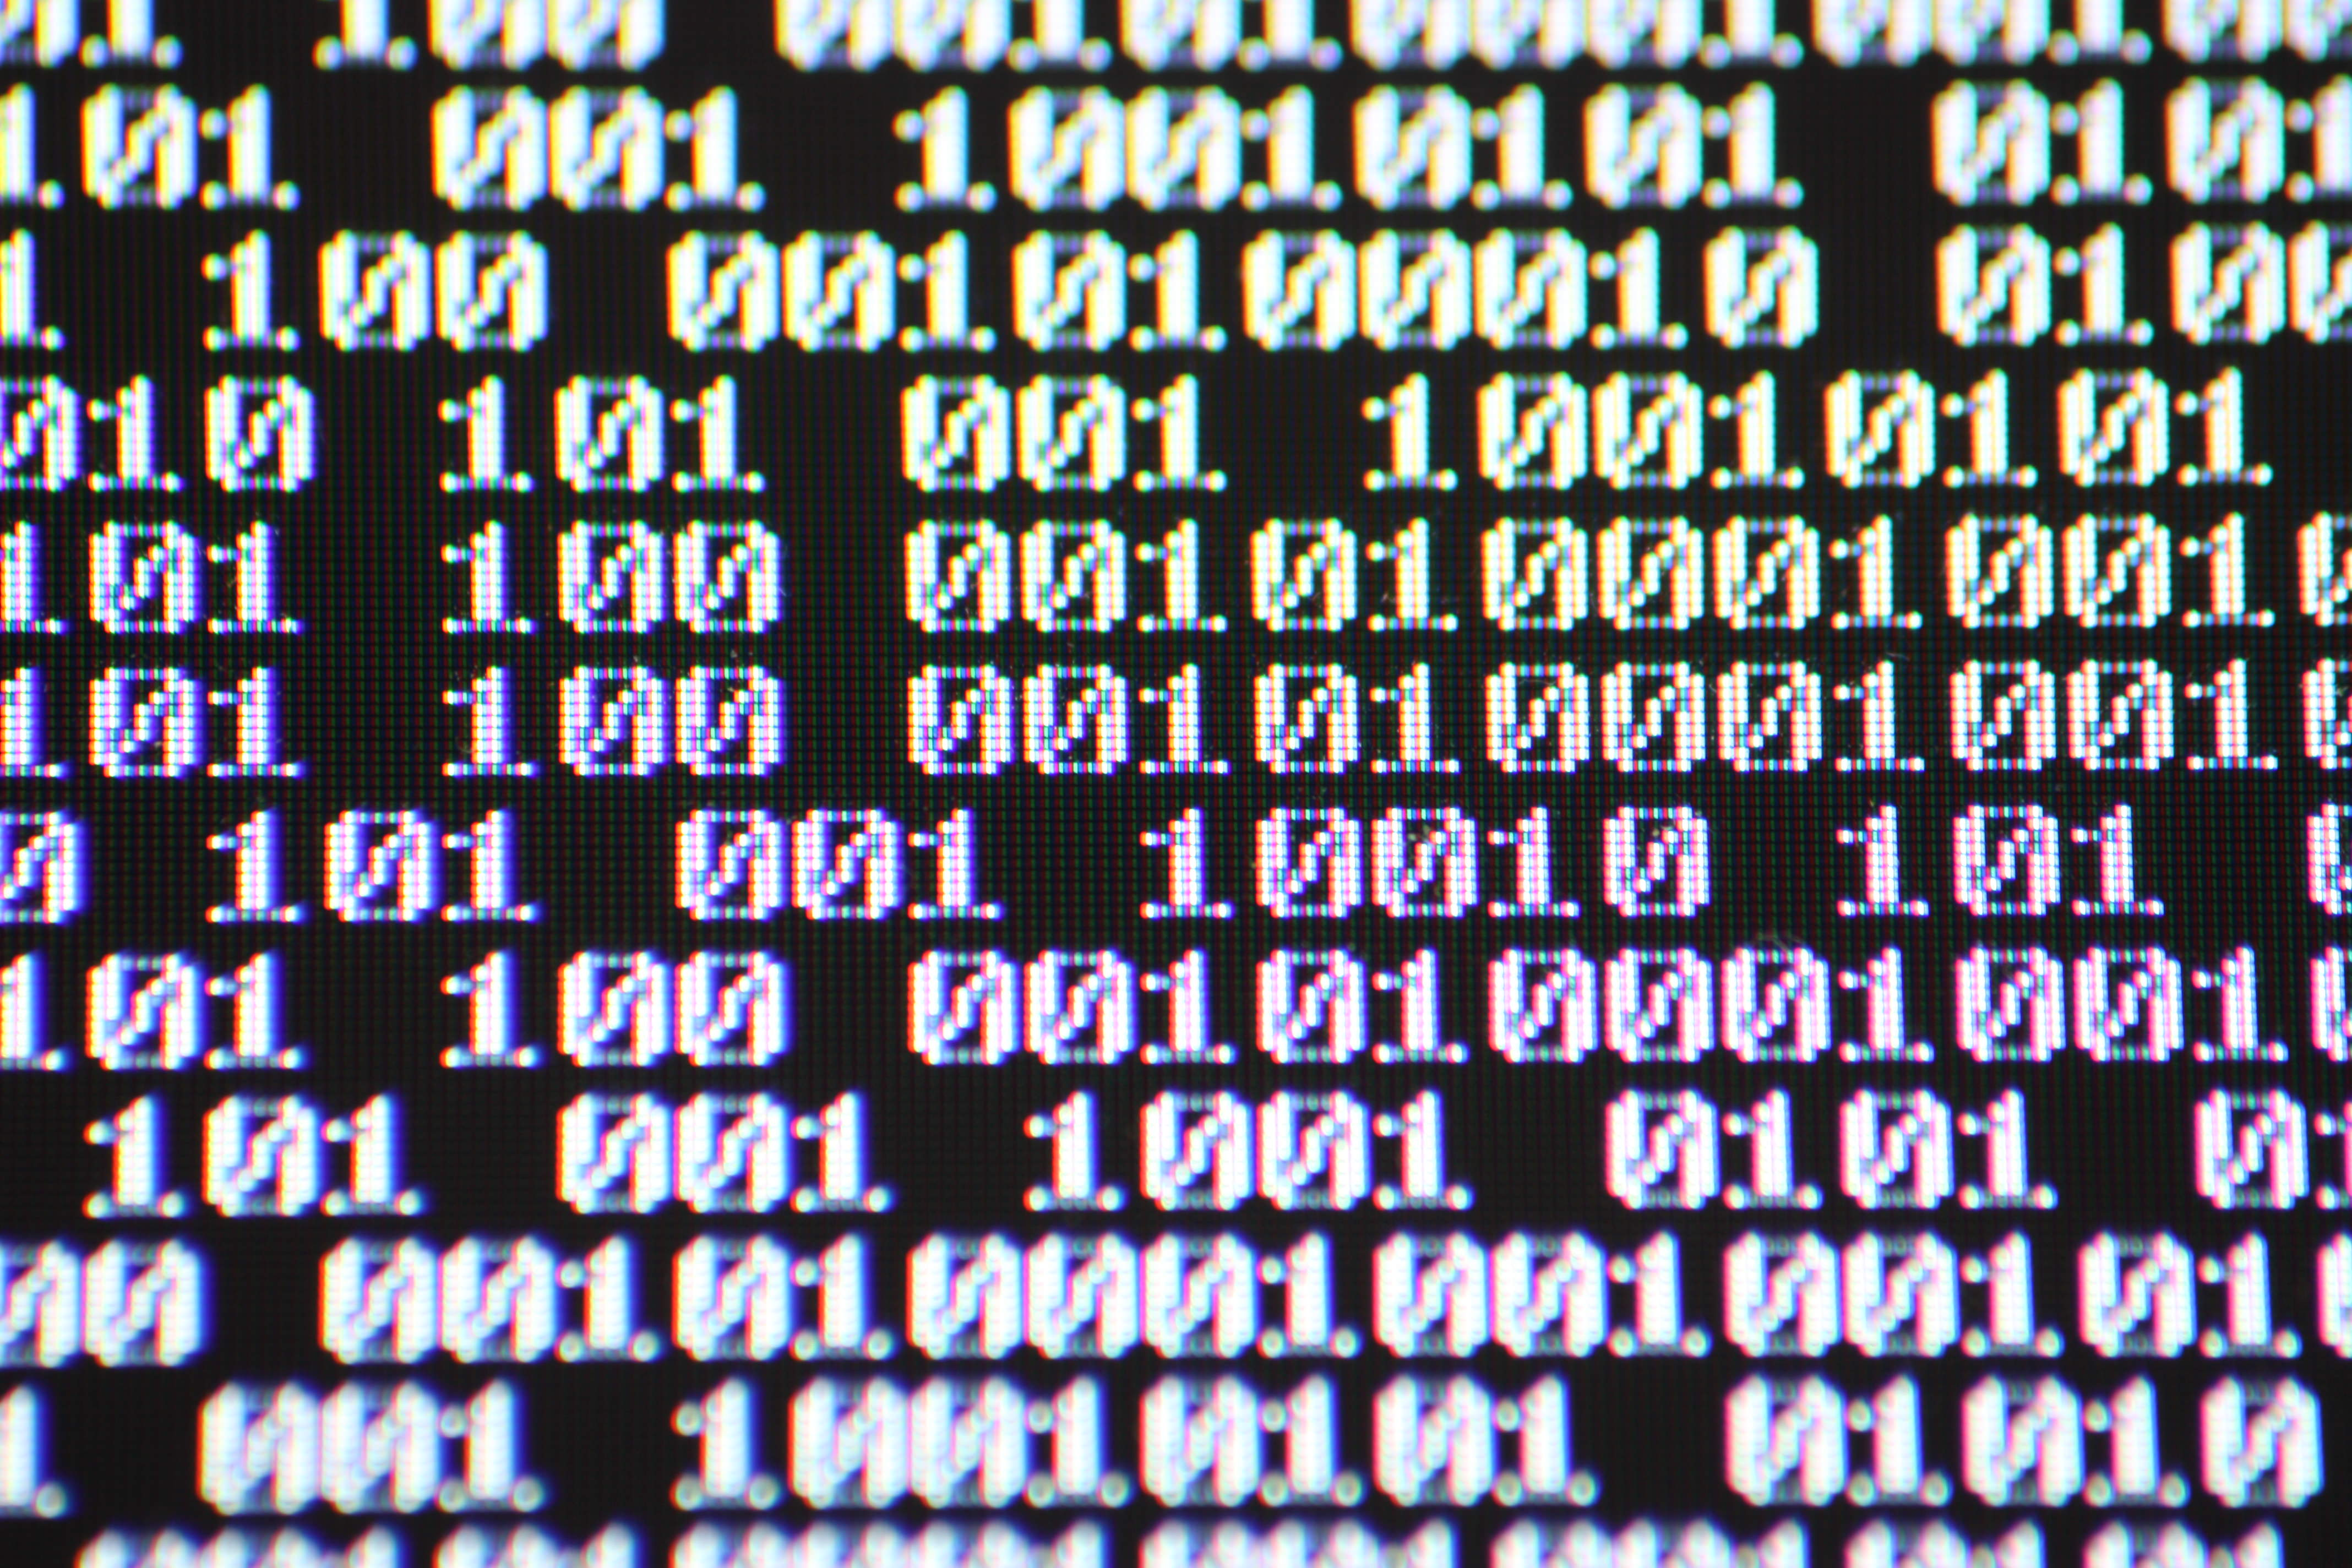 3 Creative Ways to Leverage Big Data